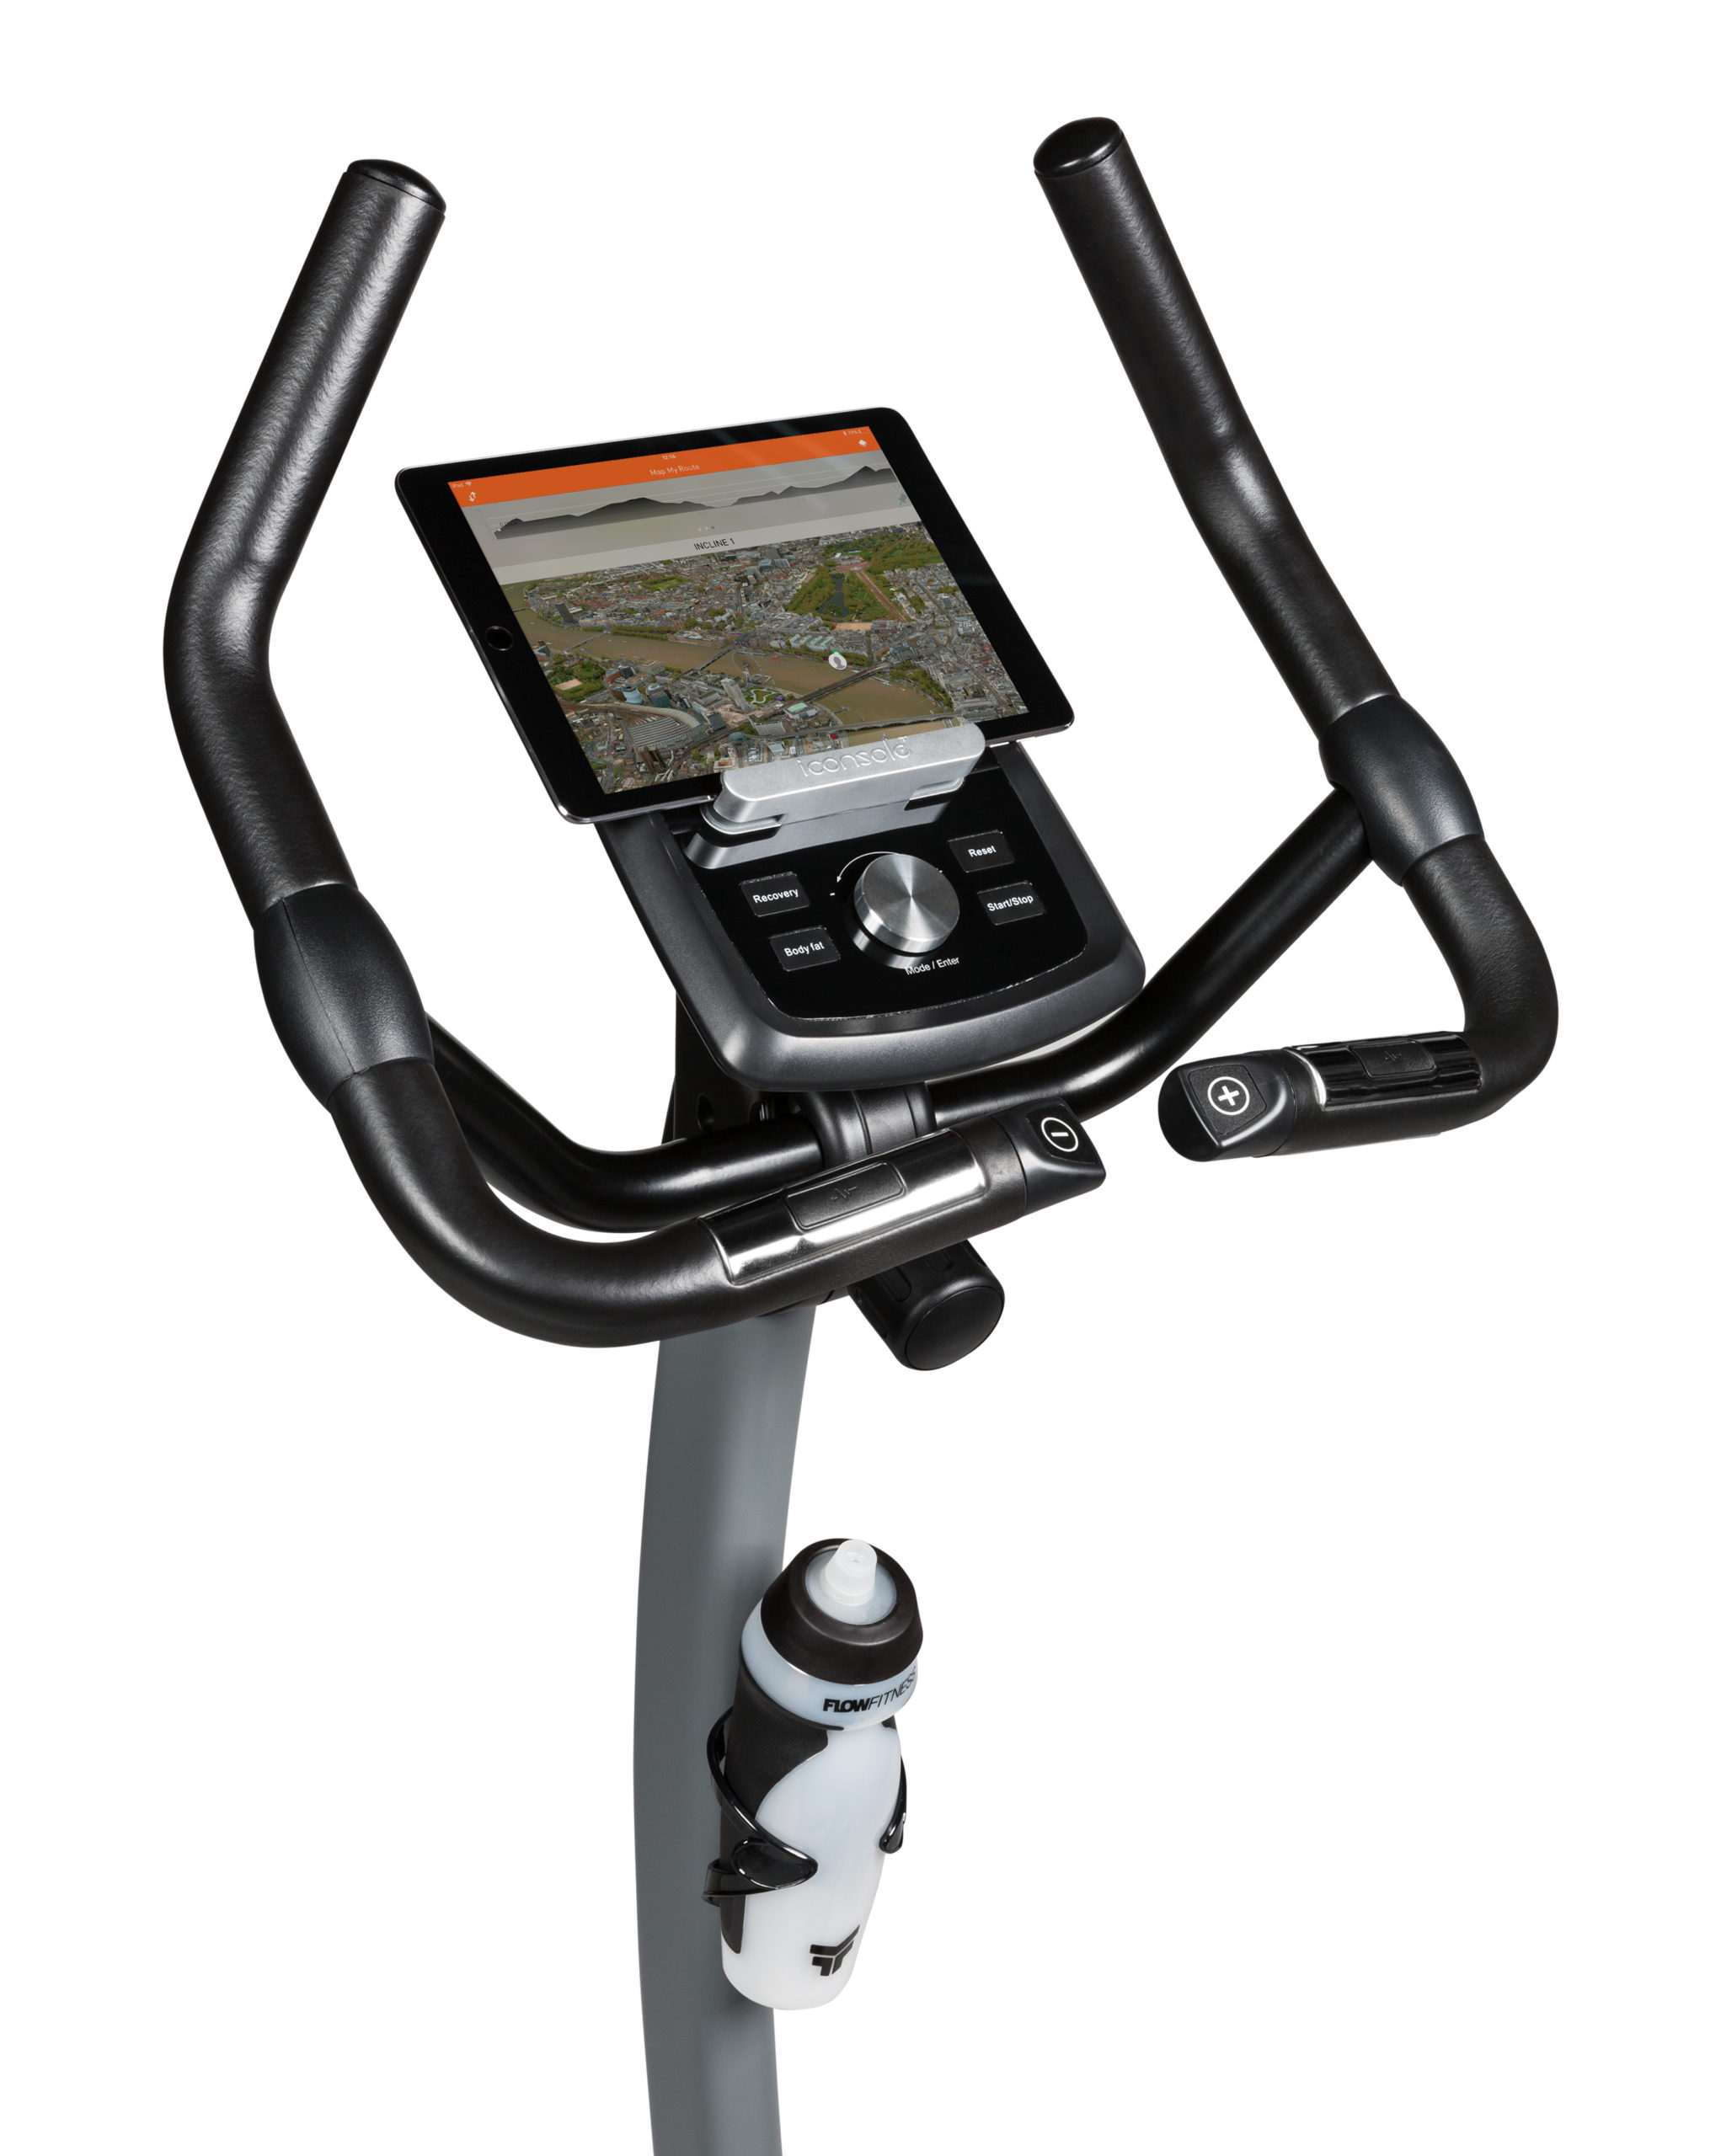 Flow Fitness Tabel Turner DHT2500i Hometrainer 7